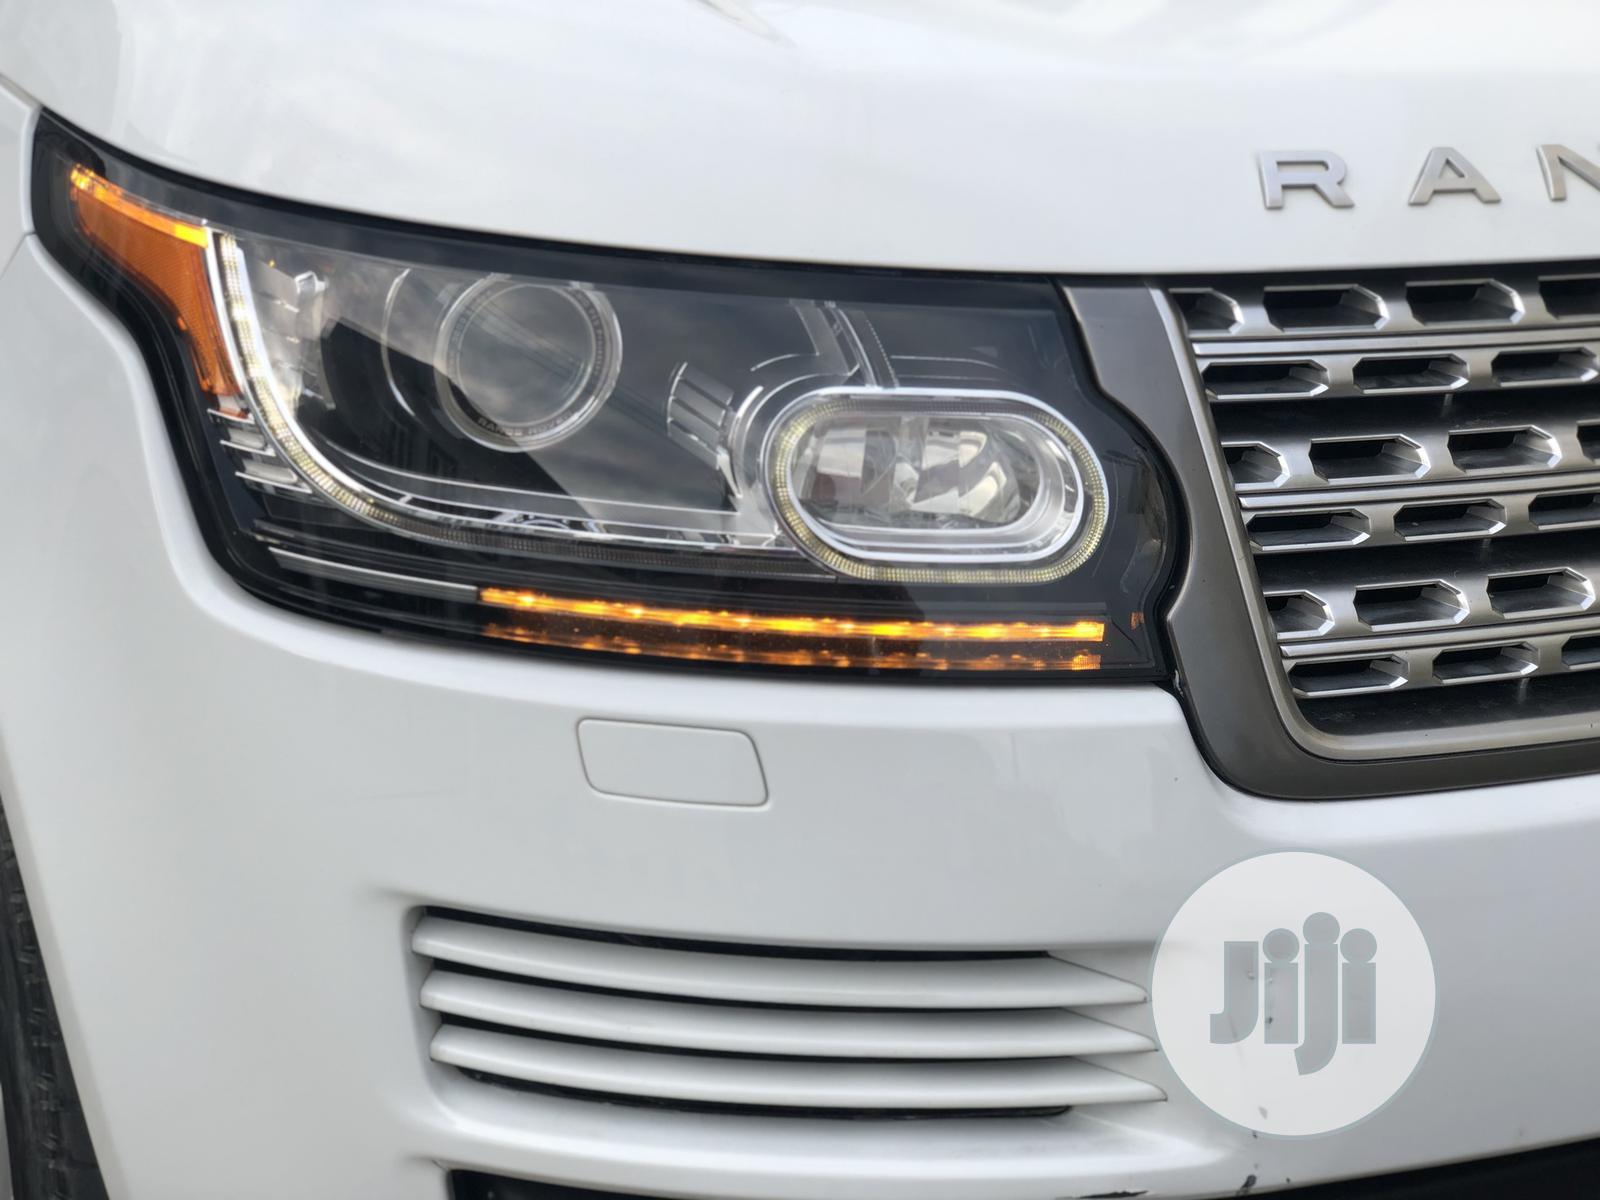 Land Rover Range Rover Vogue 2015 White | Cars for sale in Lekki, Lagos State, Nigeria